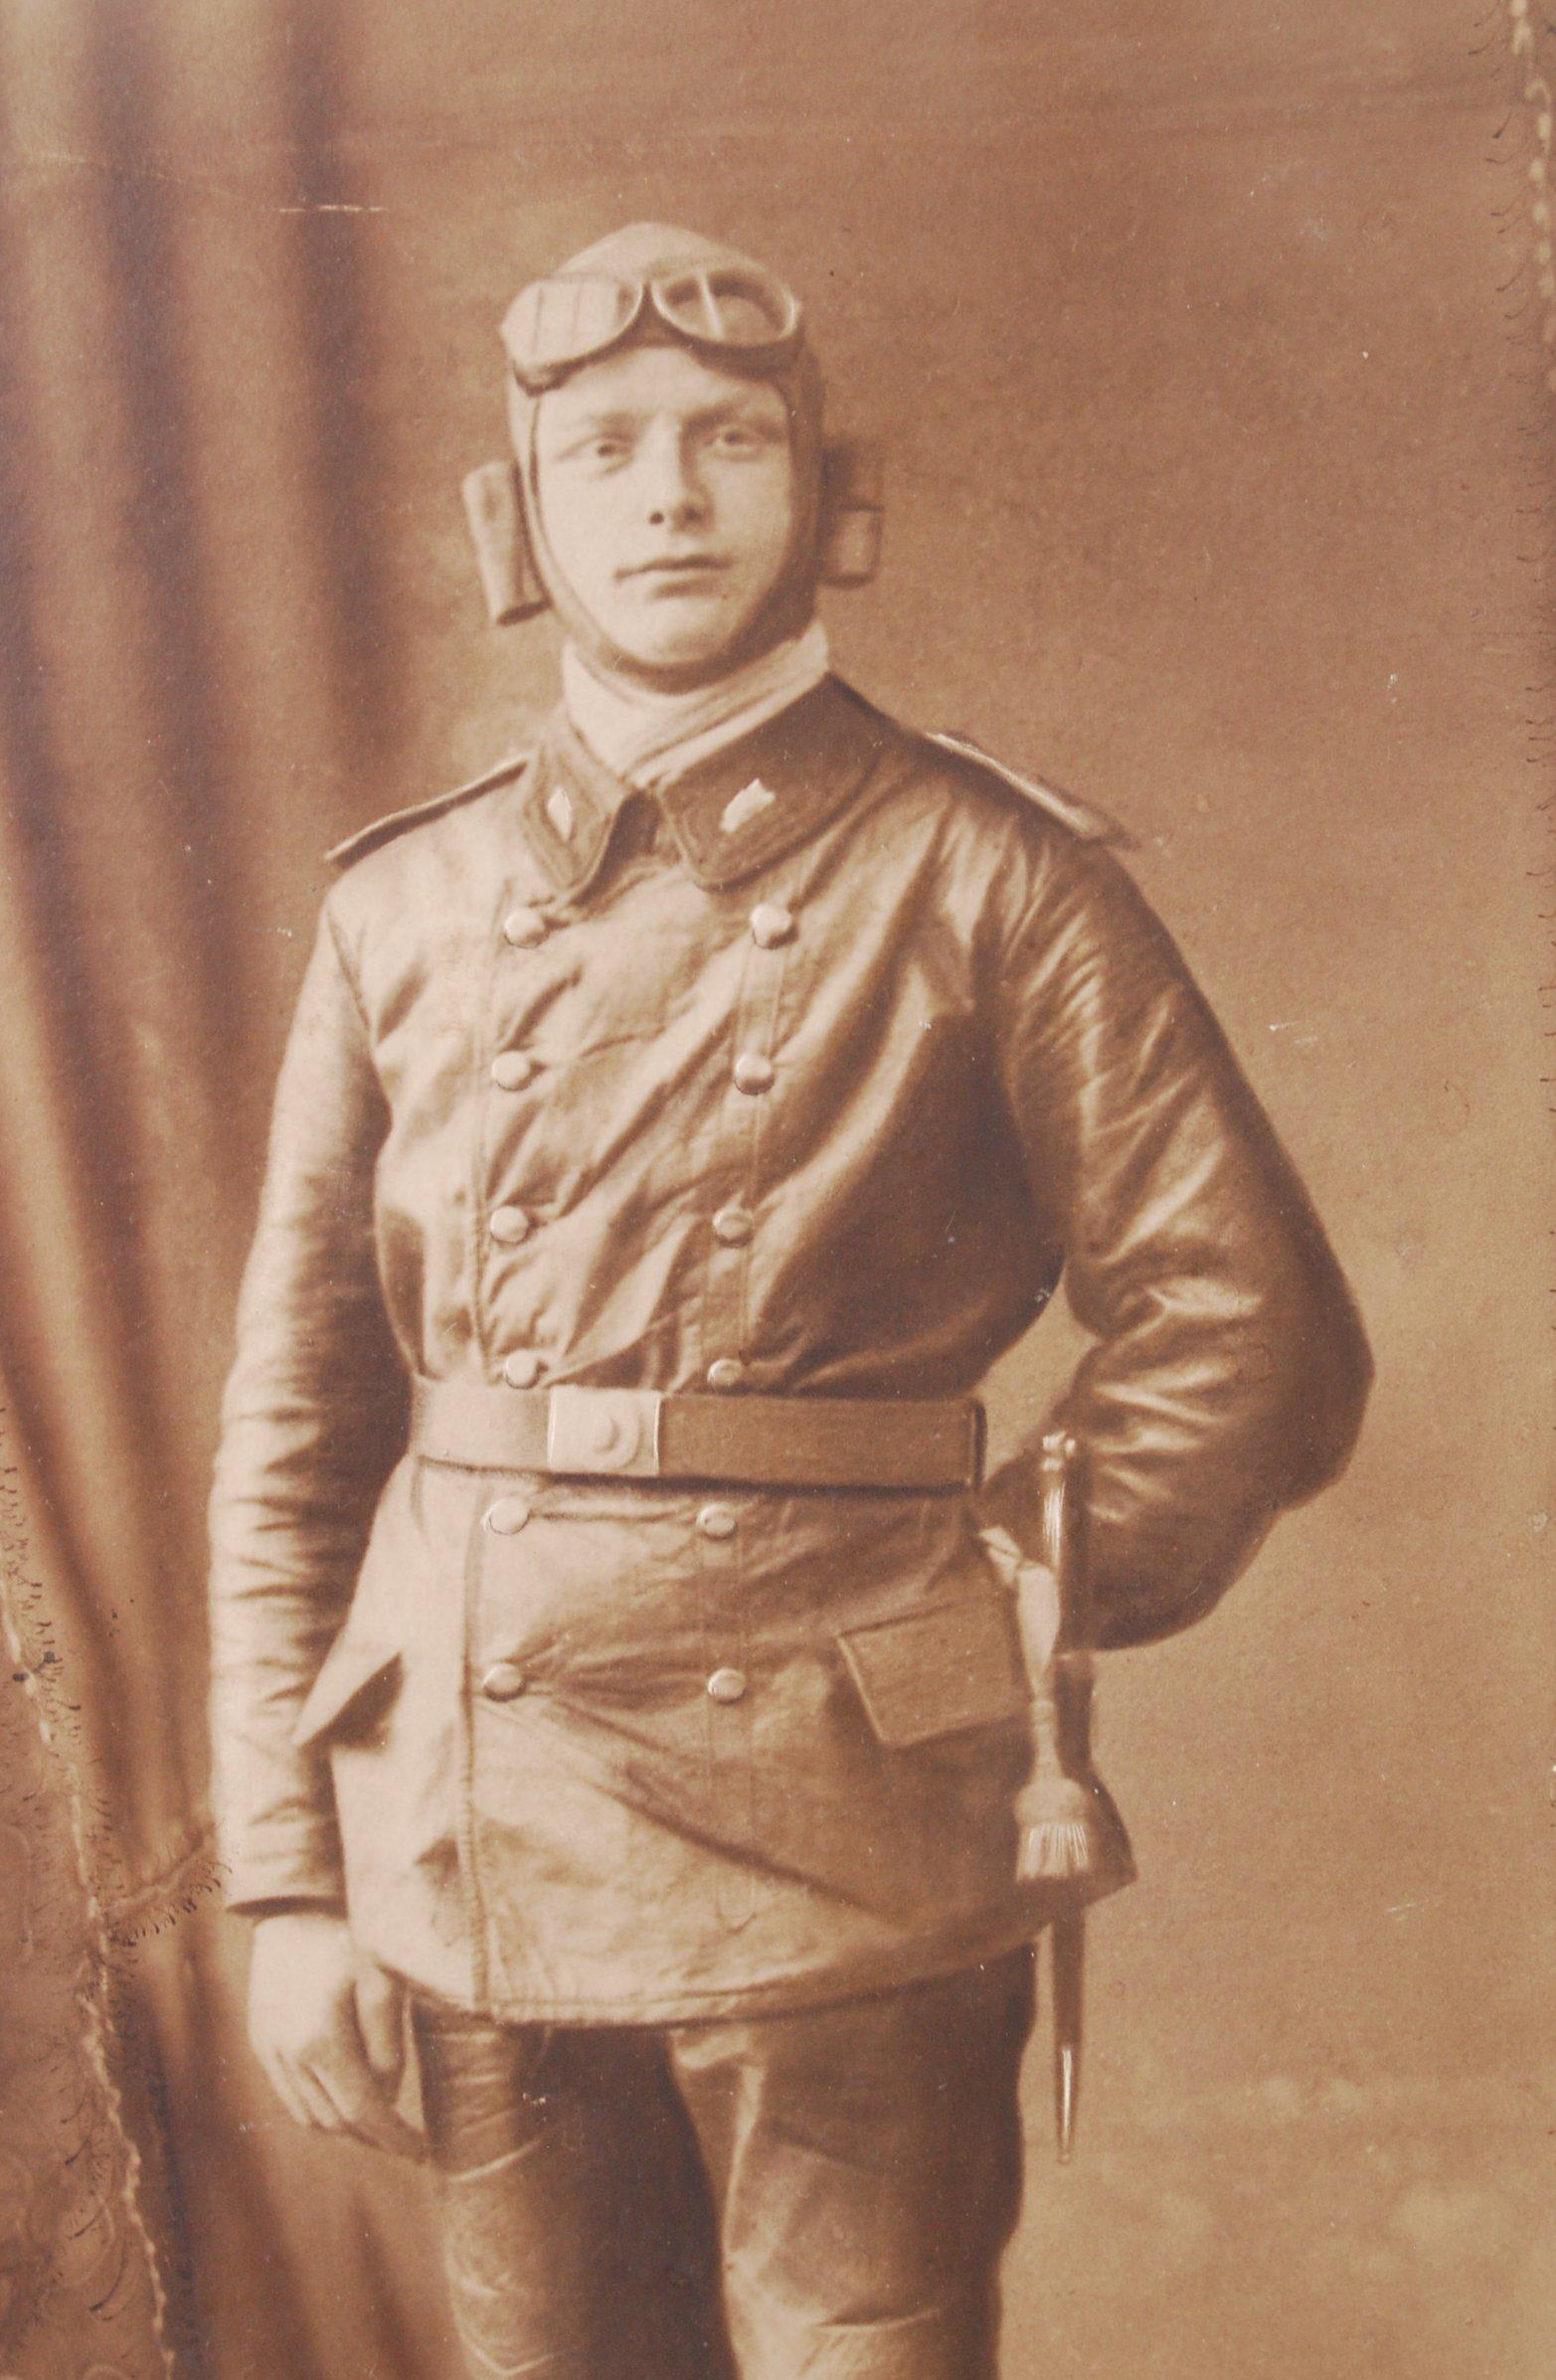 Lot 307 - WWI FIRST WORLD WAR PHOTOGRAPH OF GERMAN AVIATOR